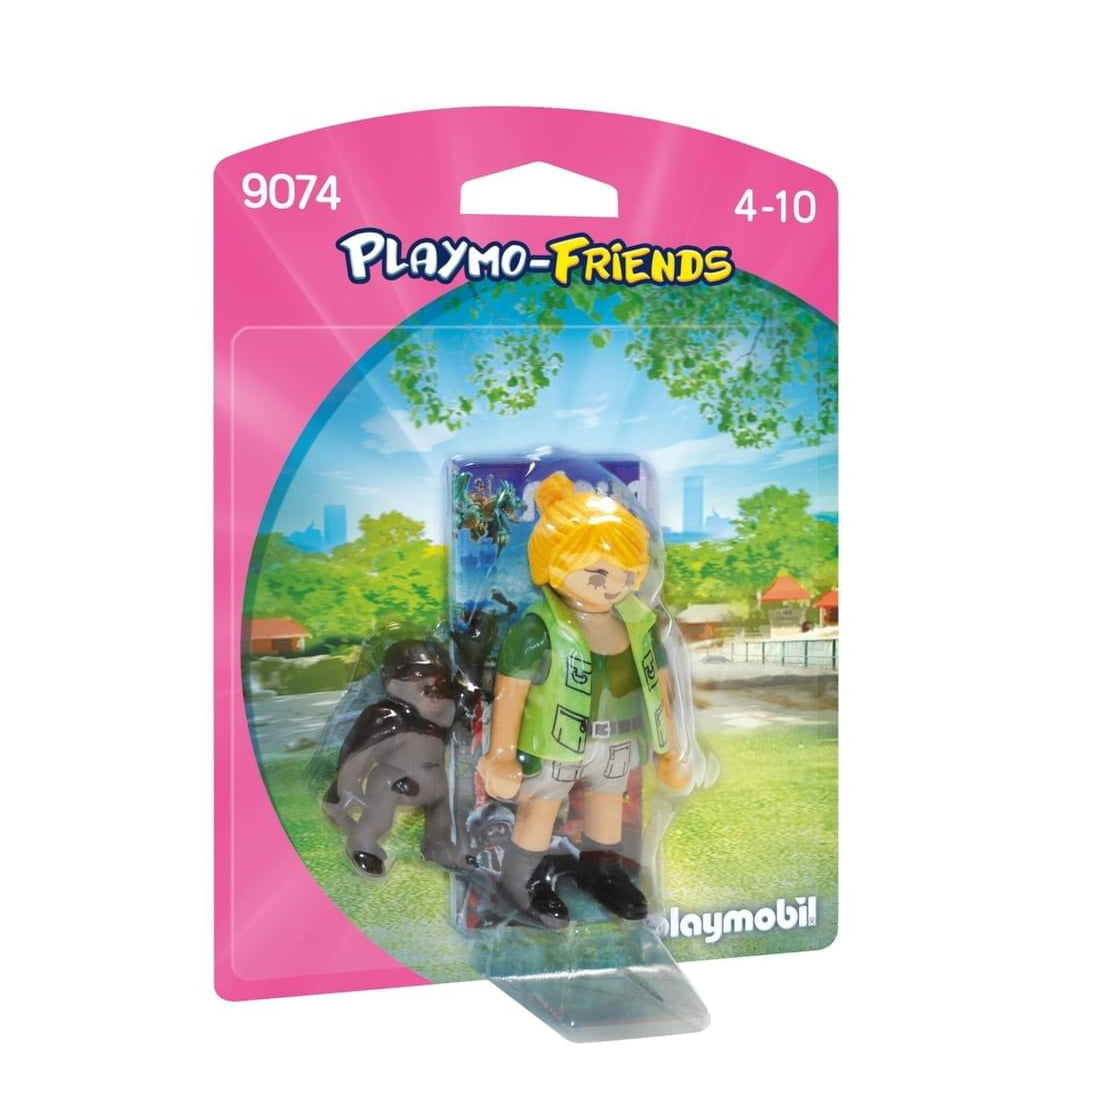 PLAYMOBIL - PLAYMO-FRIENDS - 9074